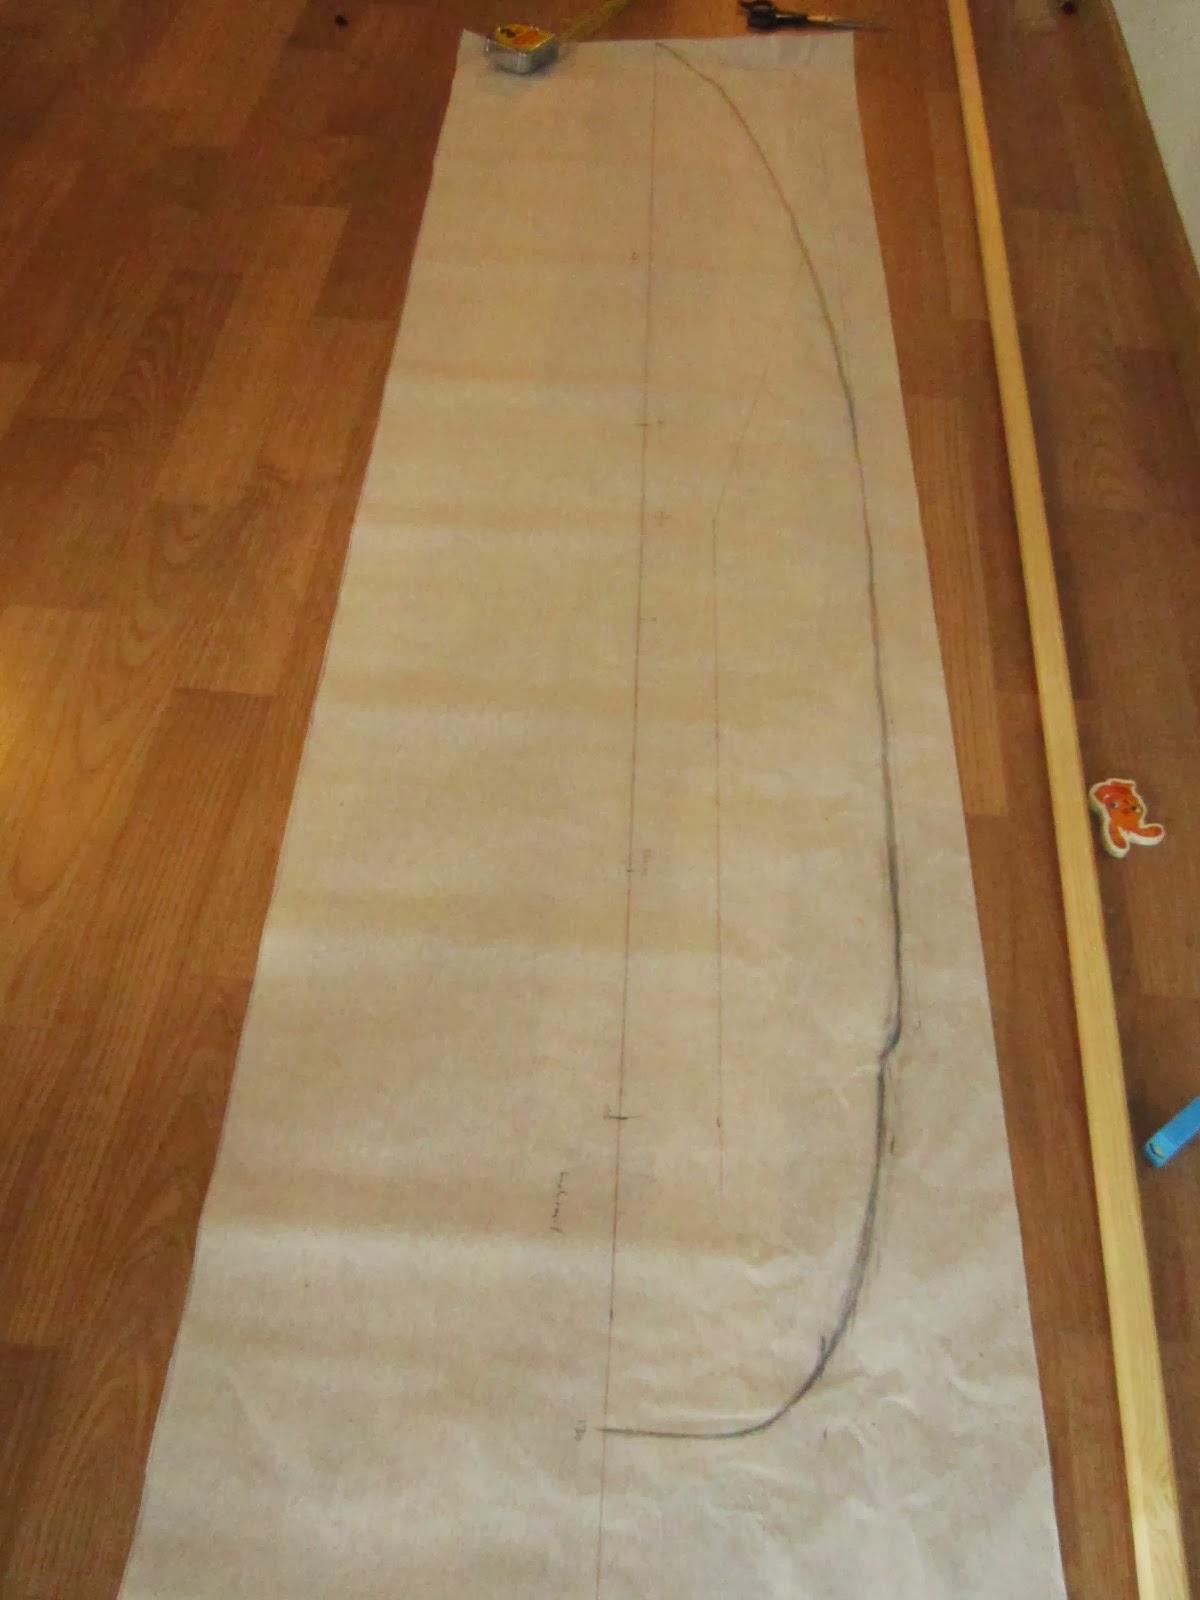 Next Shape Forming Upon Diy Vacuum Press Veneer